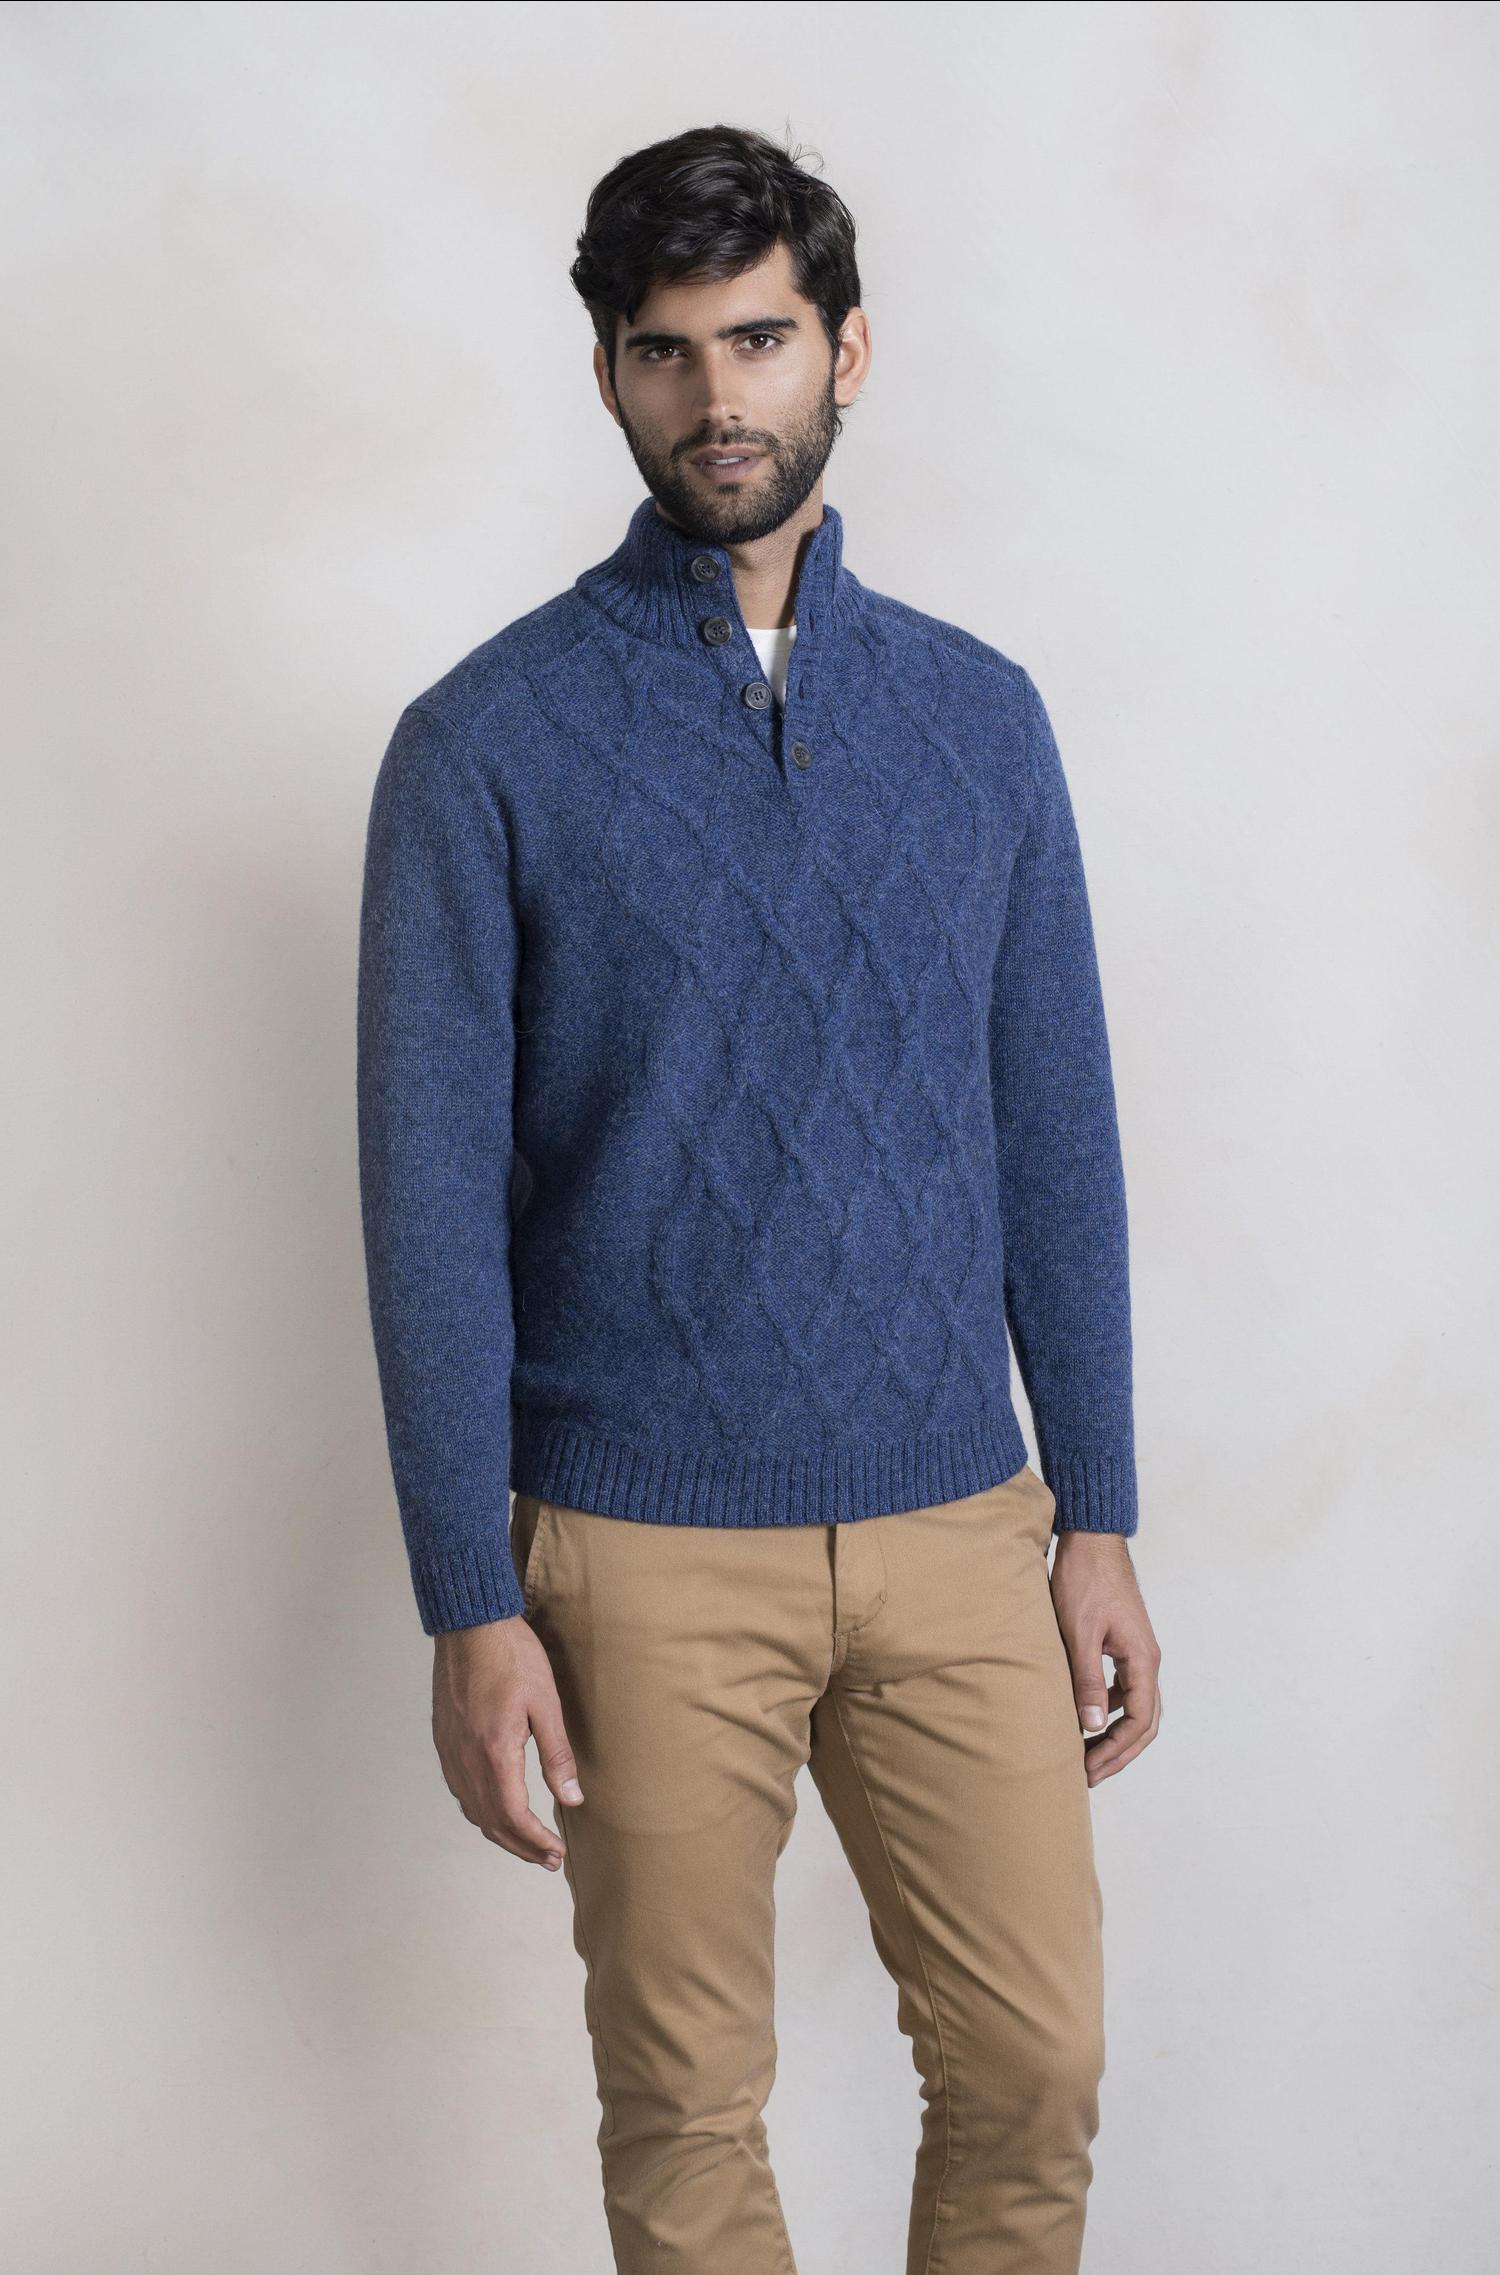 Wollen Heren Trui.Alpaca Wollen Heren Kabelvest Blauw Alpaca Fashion